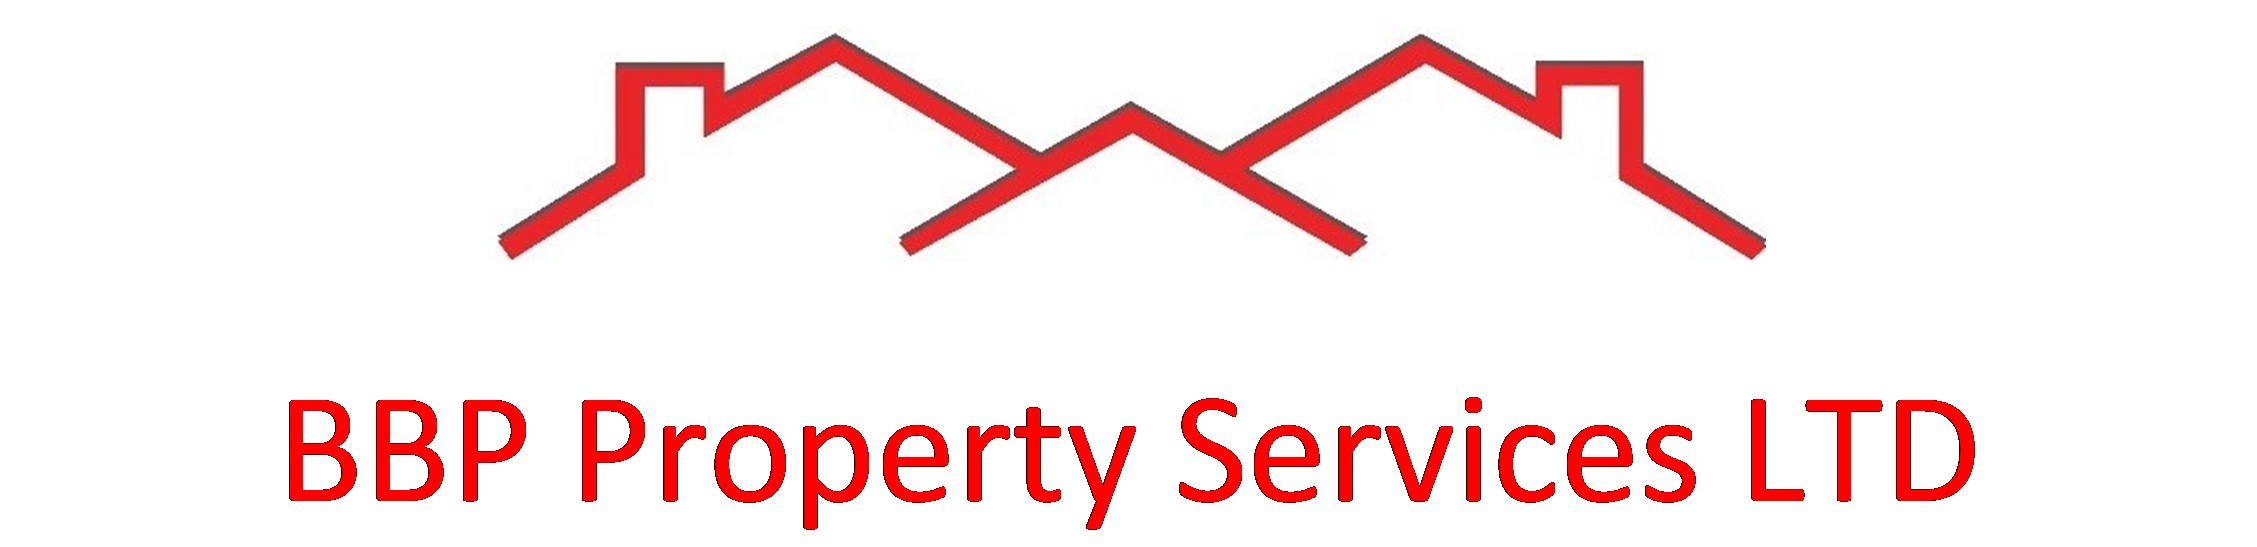 BBP Property Services Ltd Verified Logo